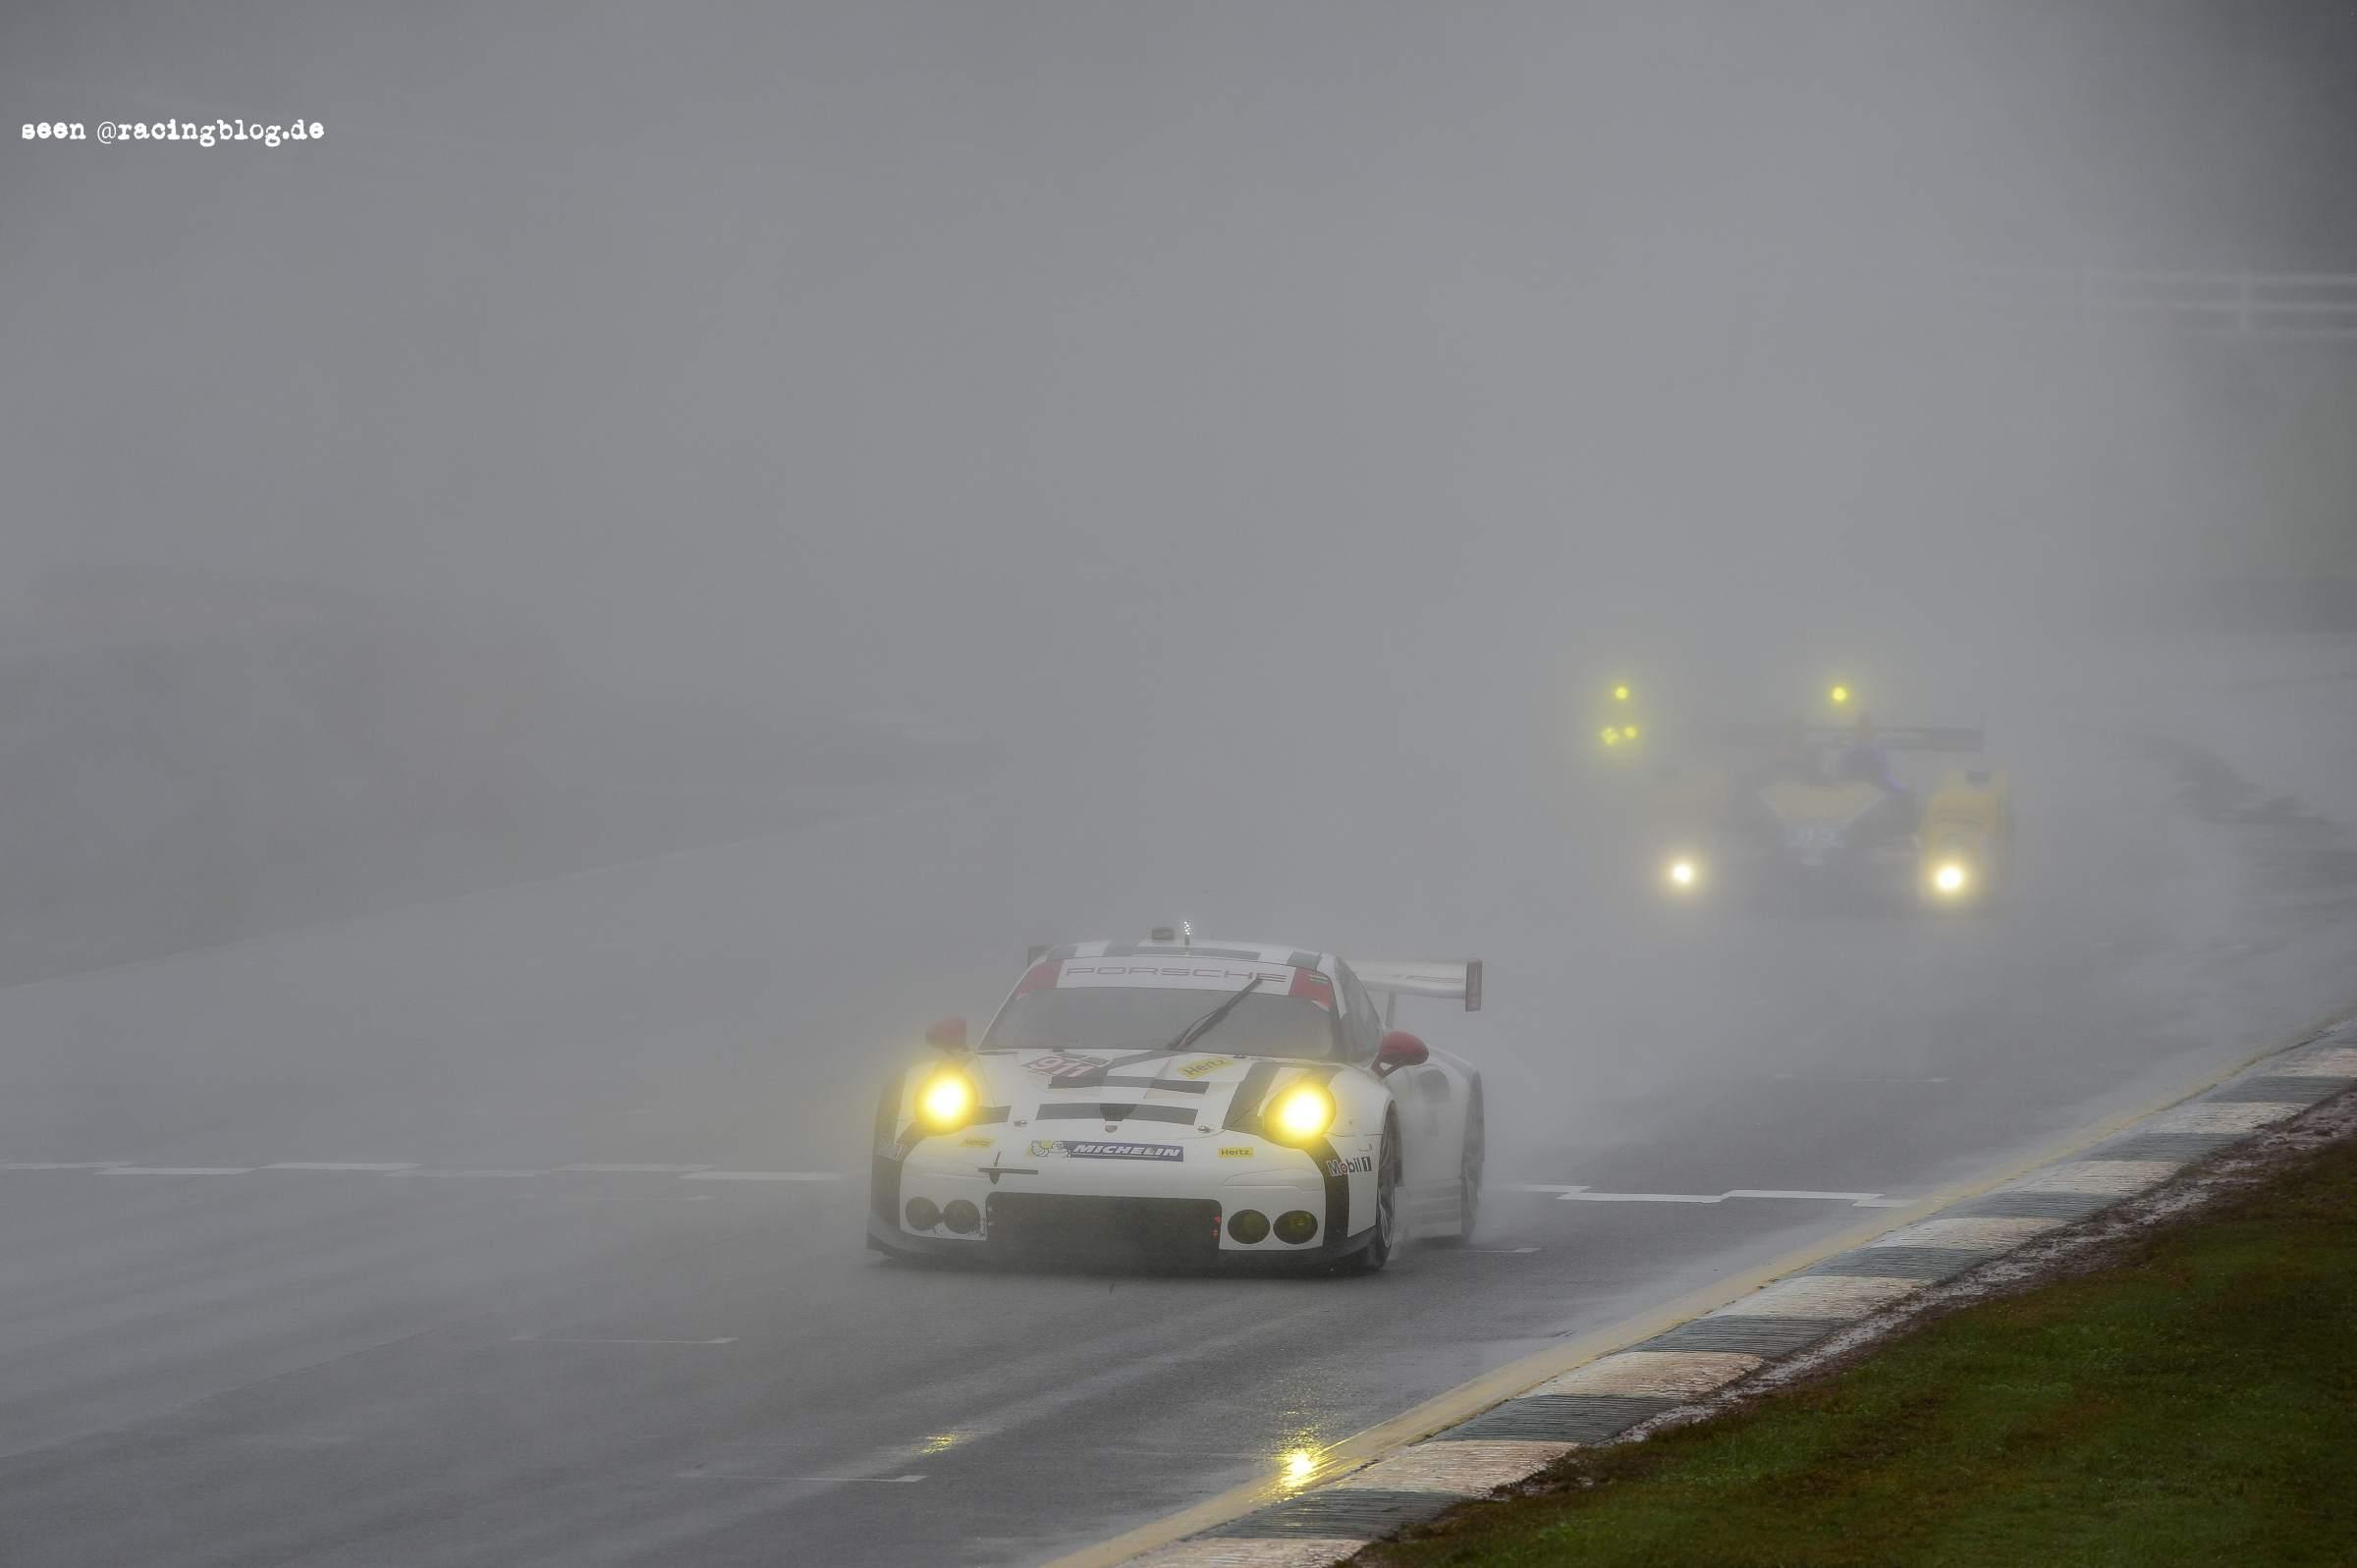 Imsa Live Stream >> USCC: Bericht Petit Le Mans 2015 – Regenchaos – Racingblog